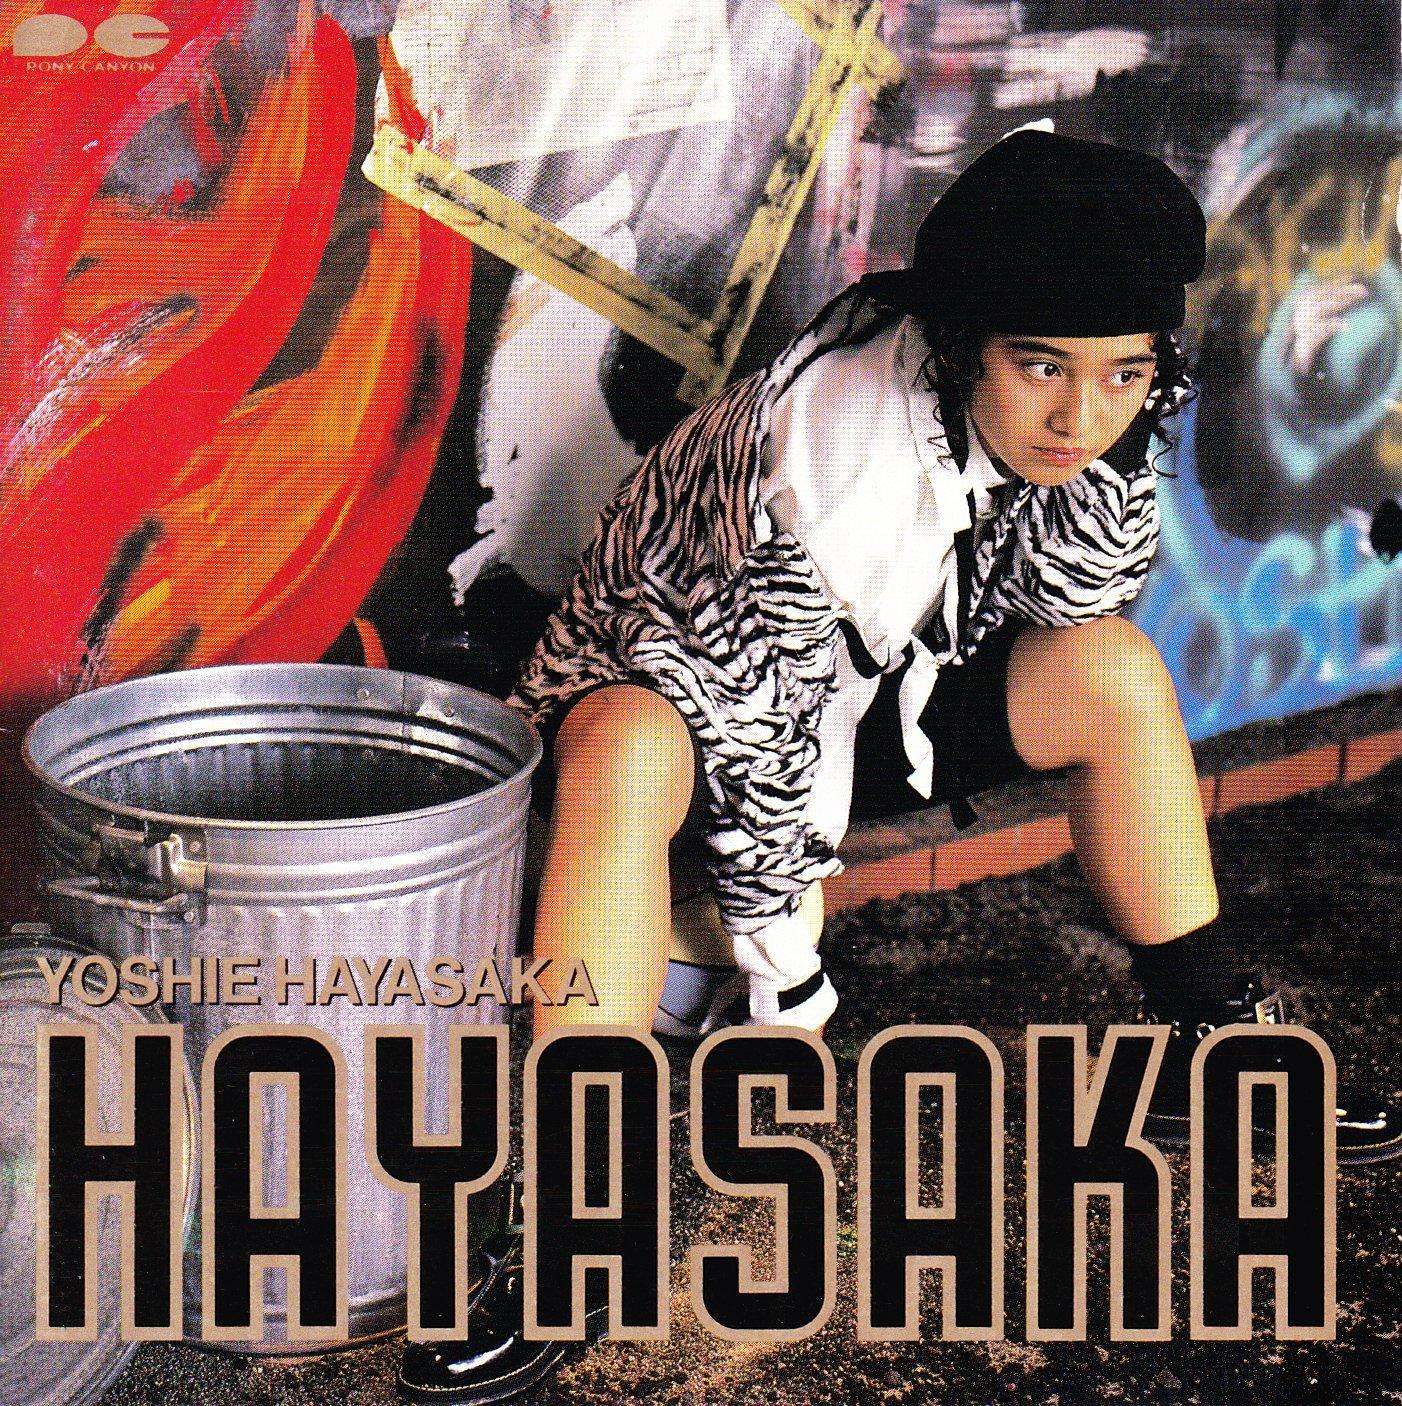 Yoshie Hayasaka Yoshie Hayasaka new pictures